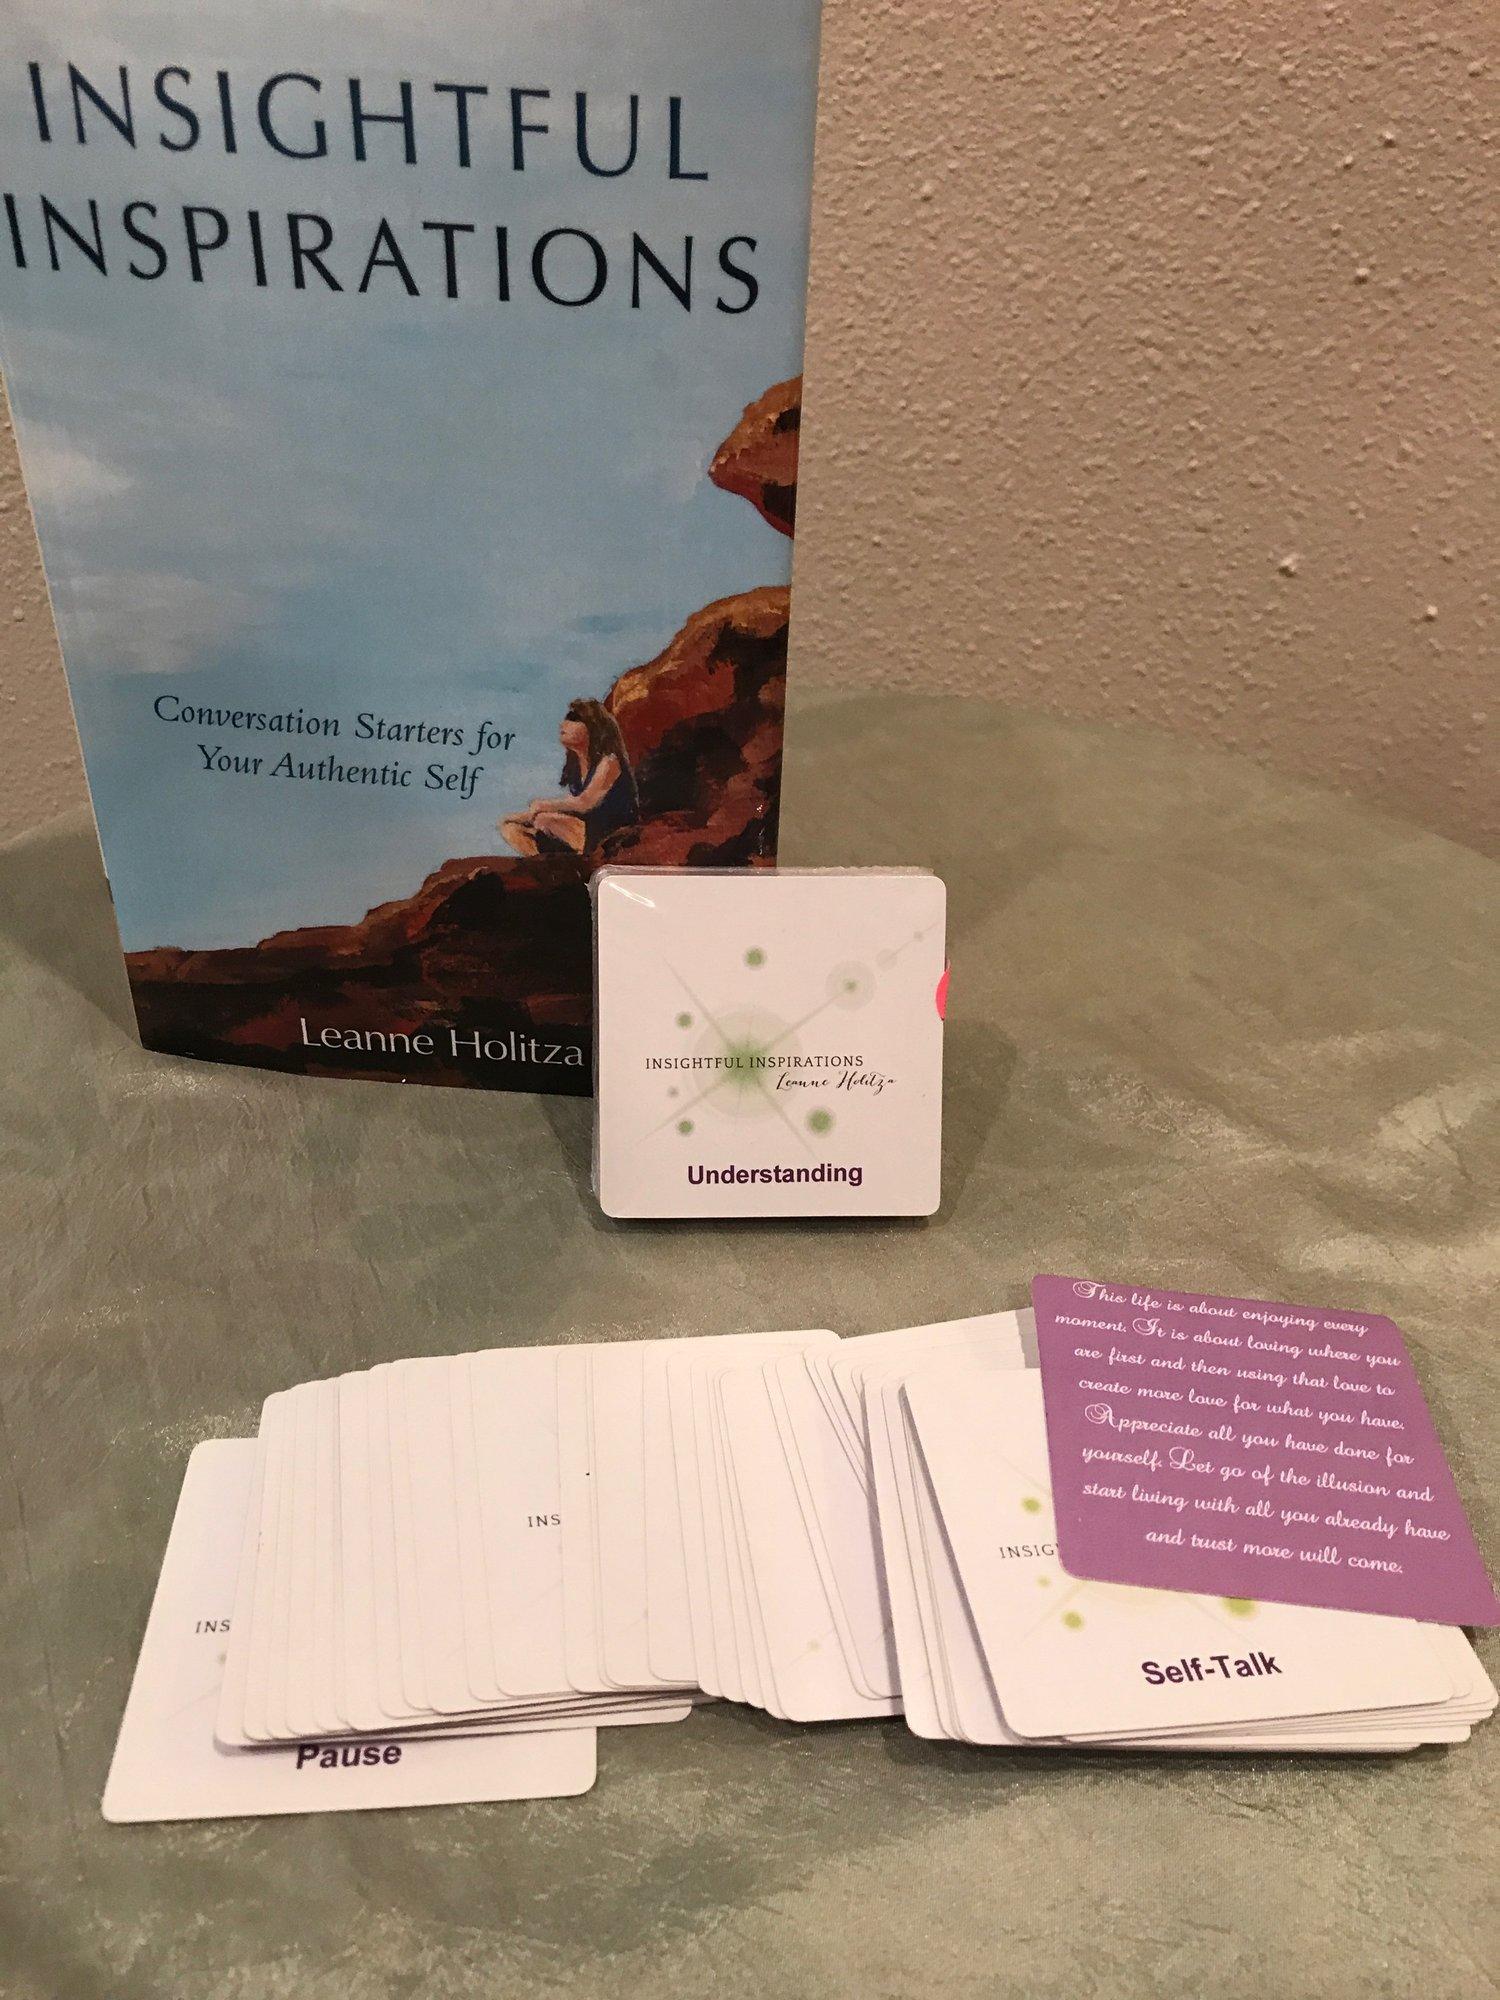 insightful inspiration oracle card deck insightful inspirations